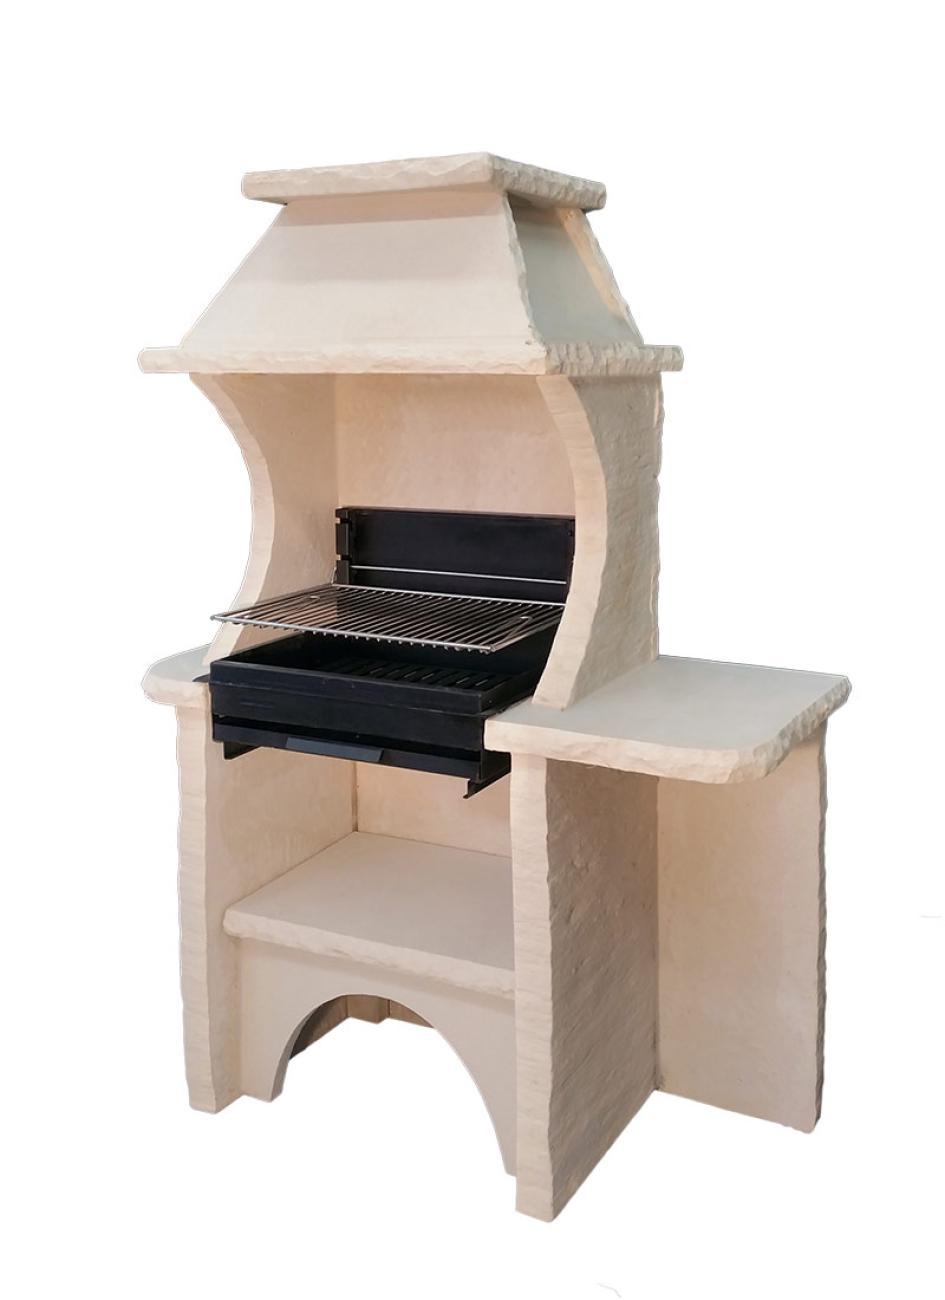 barbecue en pierre reconstitu e avec hotte et gril foyer horizontal. Black Bedroom Furniture Sets. Home Design Ideas